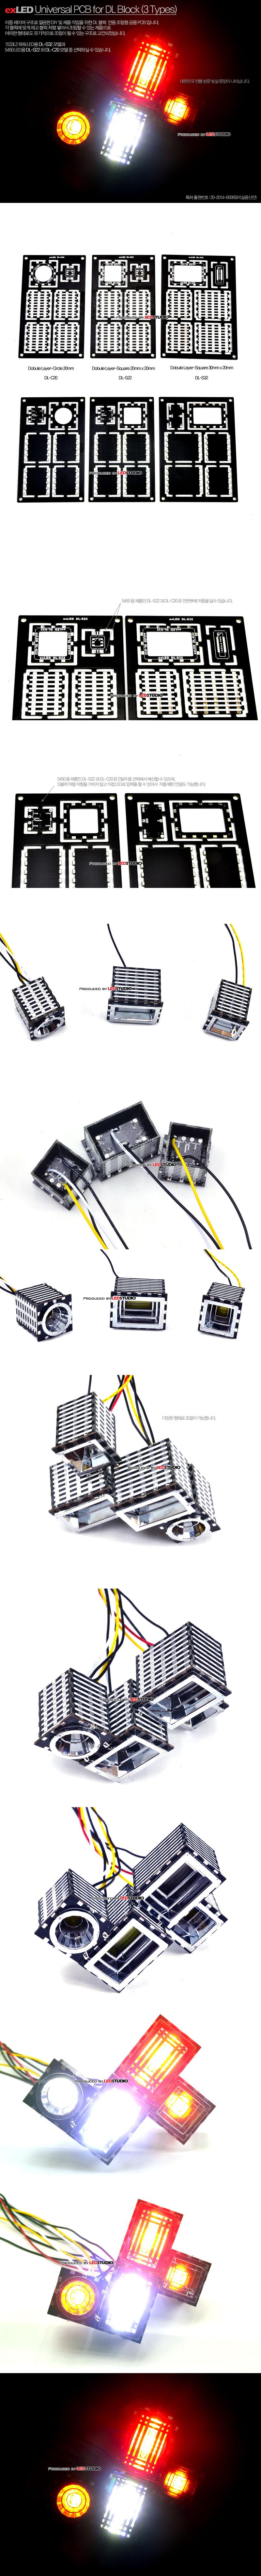 exLED DL 블럭용 전차종 공용 유니버셜 DIY KIT PCB  (DL-S32 / DL-S22 / DL-C20 中 택1)